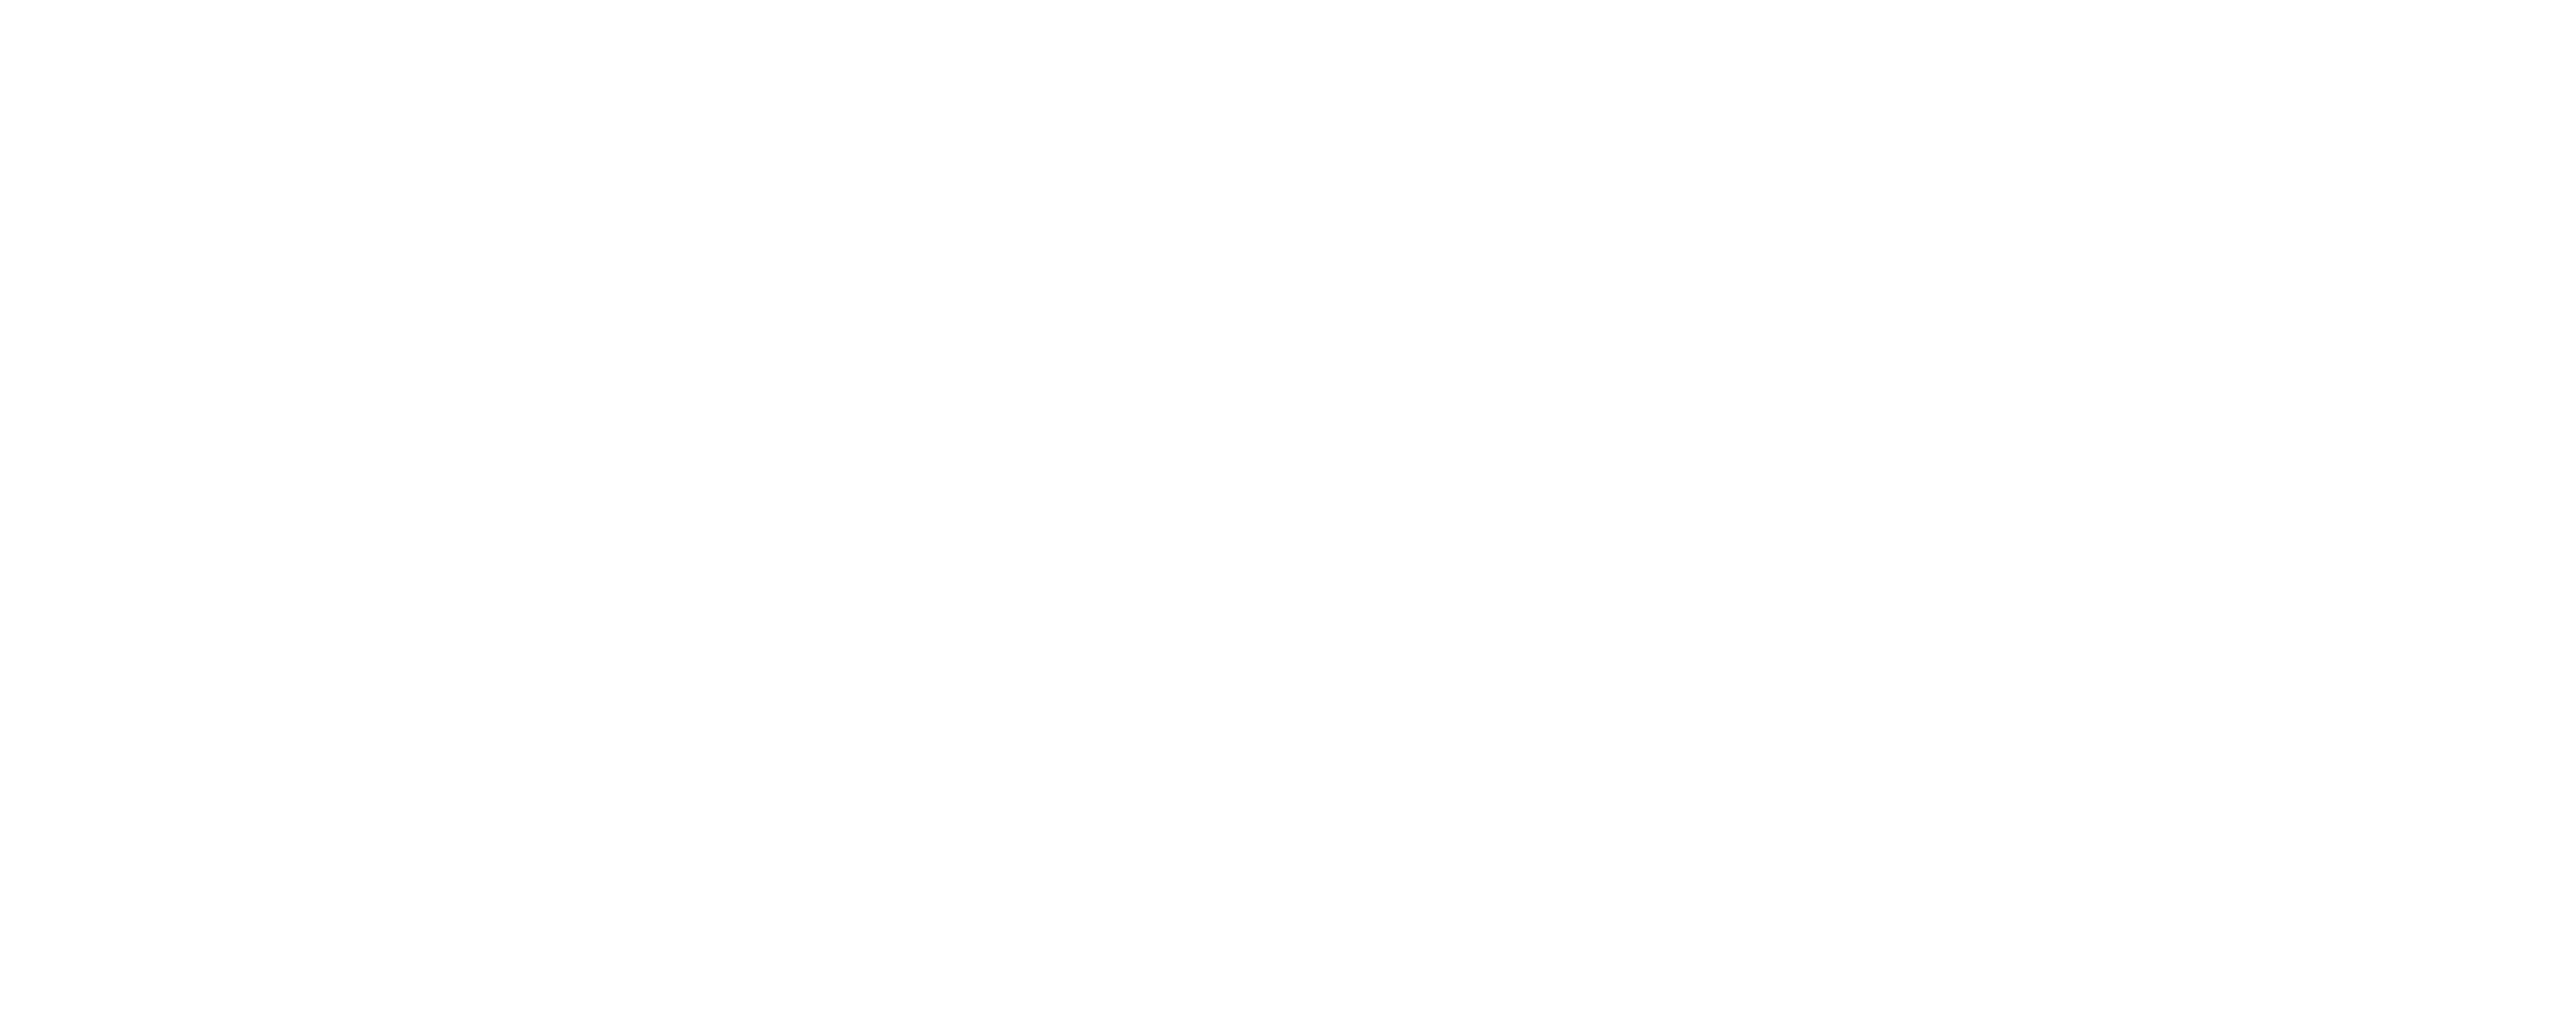 Swan-like yin yang S with shamini jain, and science, spirit, healing tagline under.